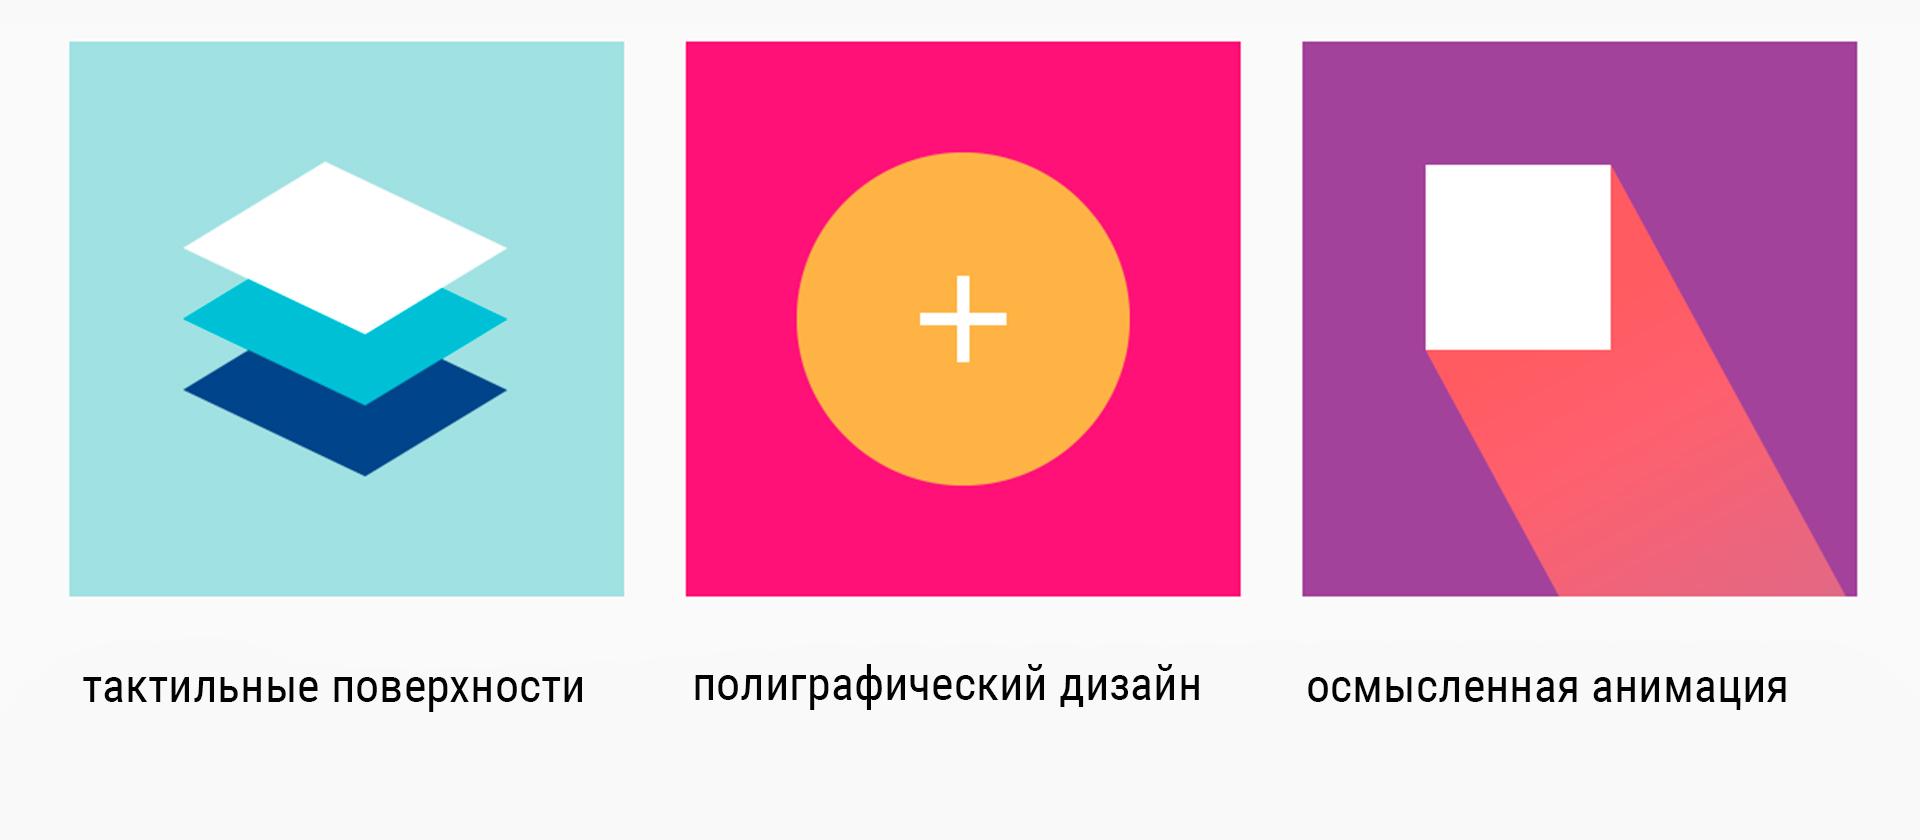 printsipy-materialnogo-dizajna